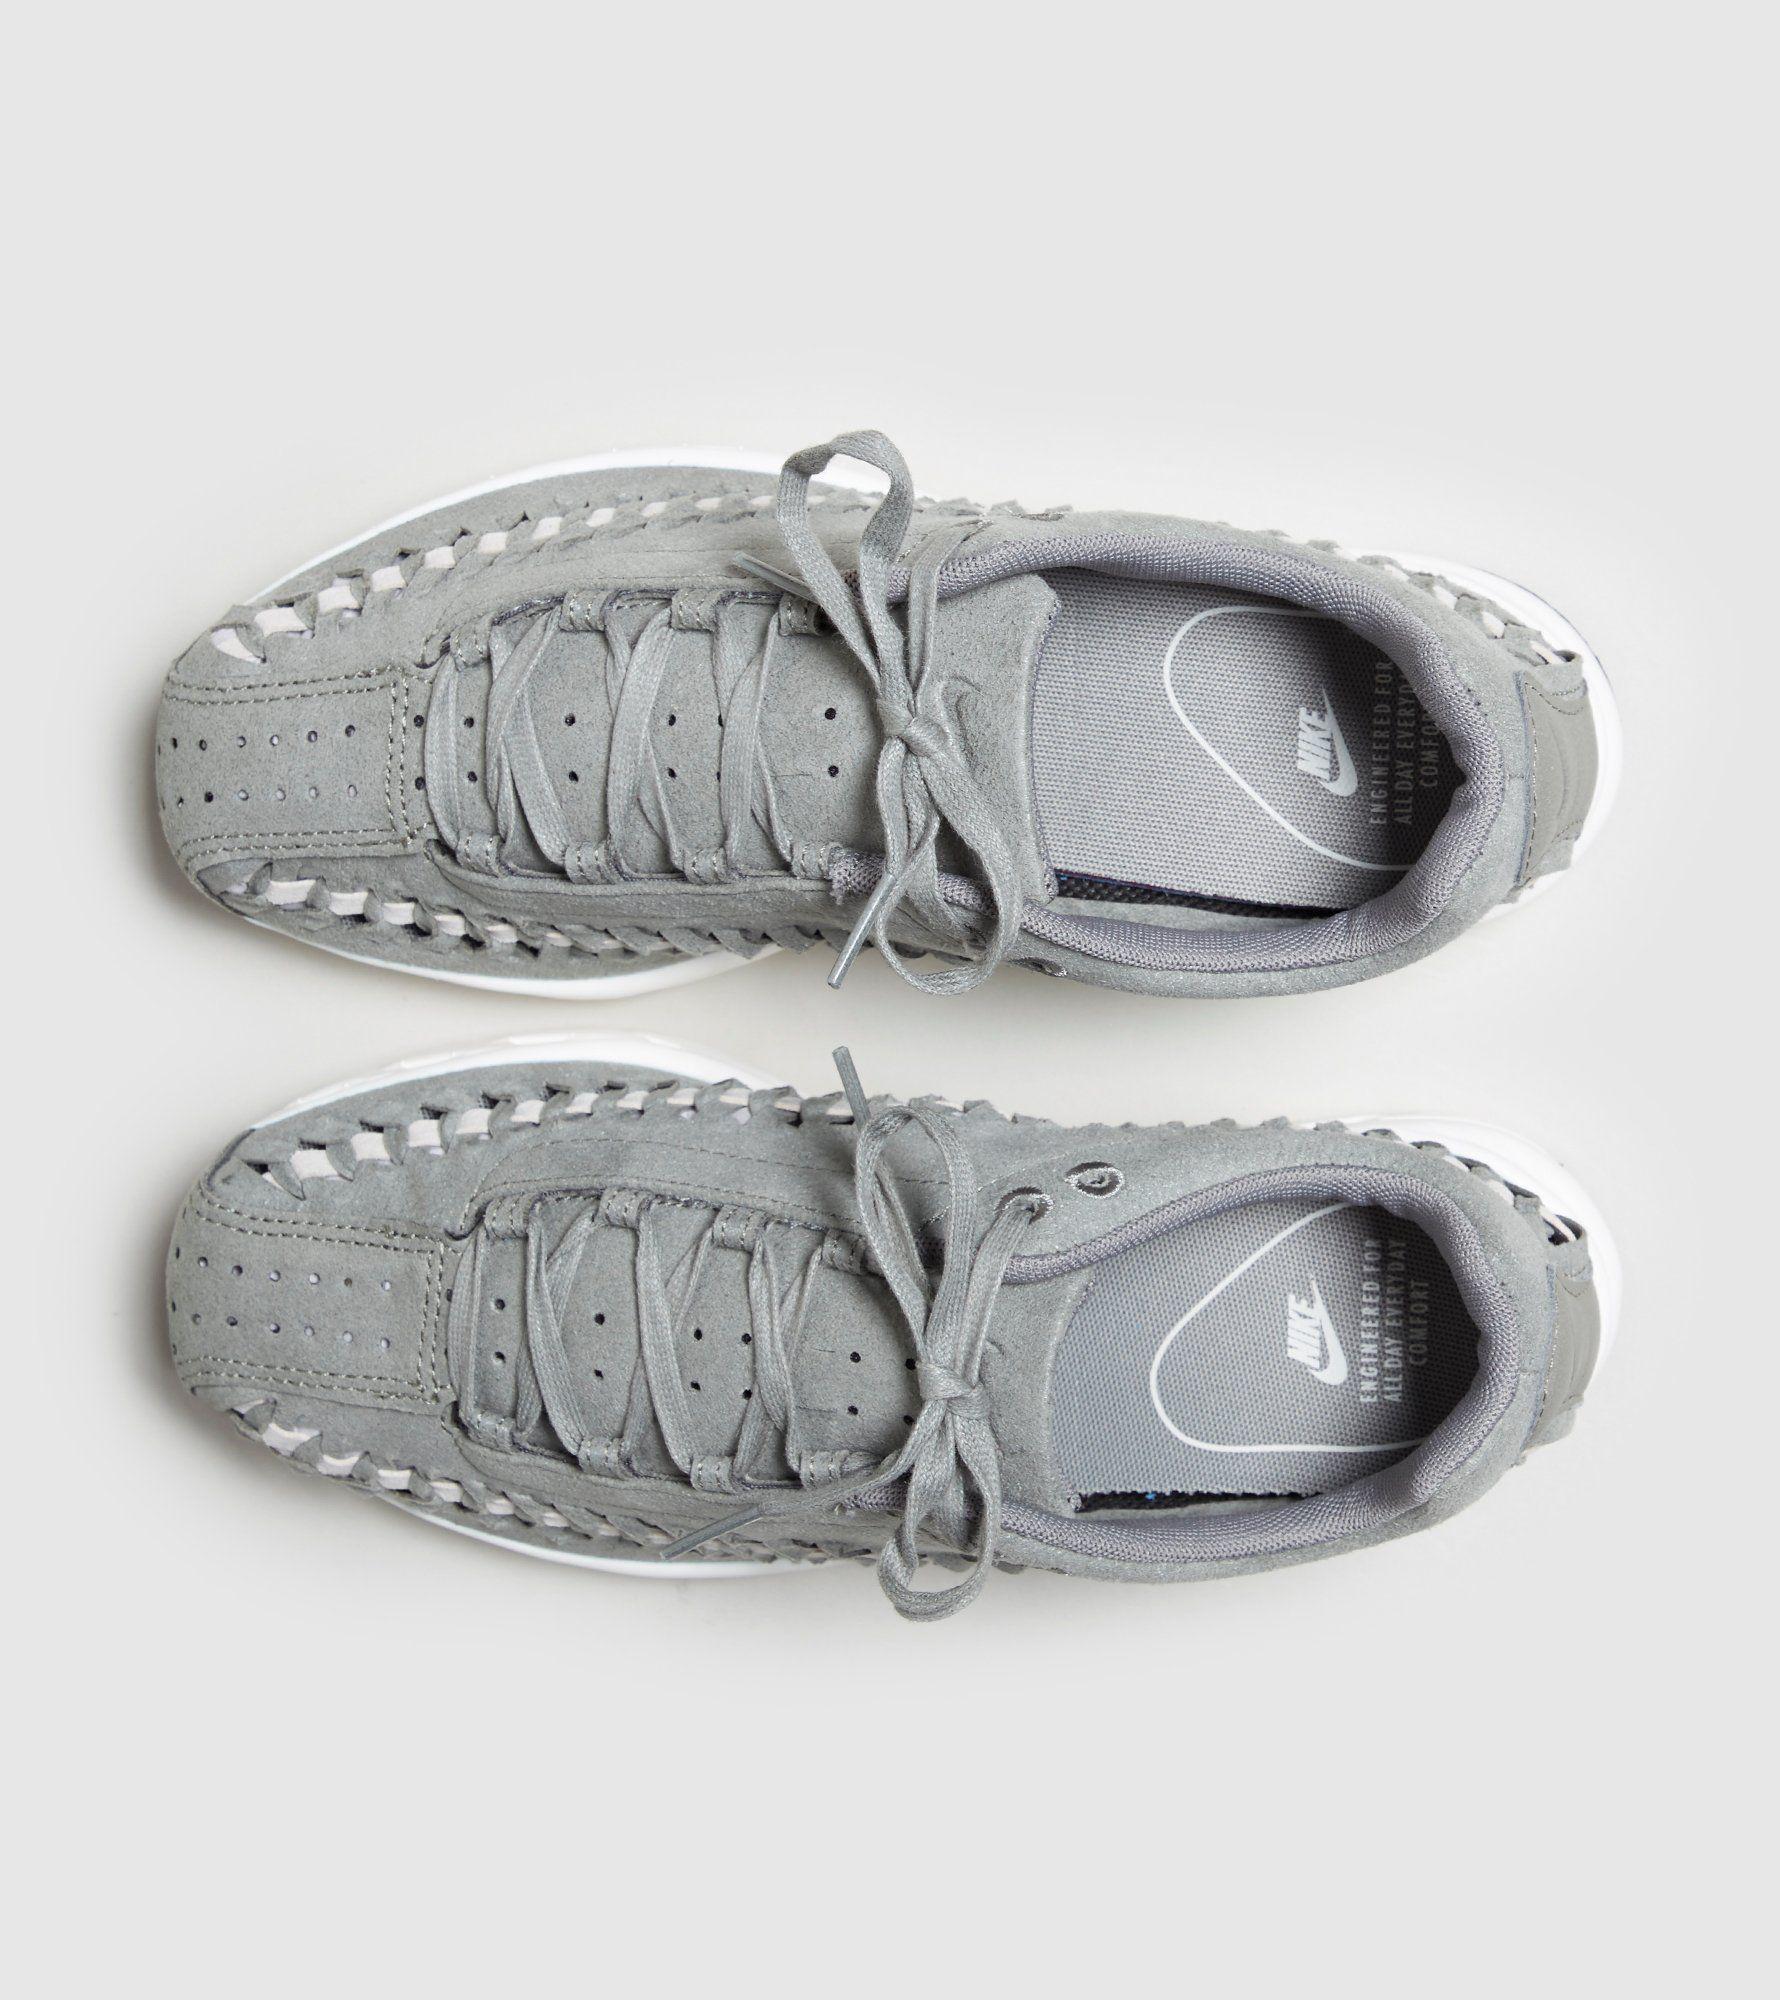 Nike Mayfly Woven Women's